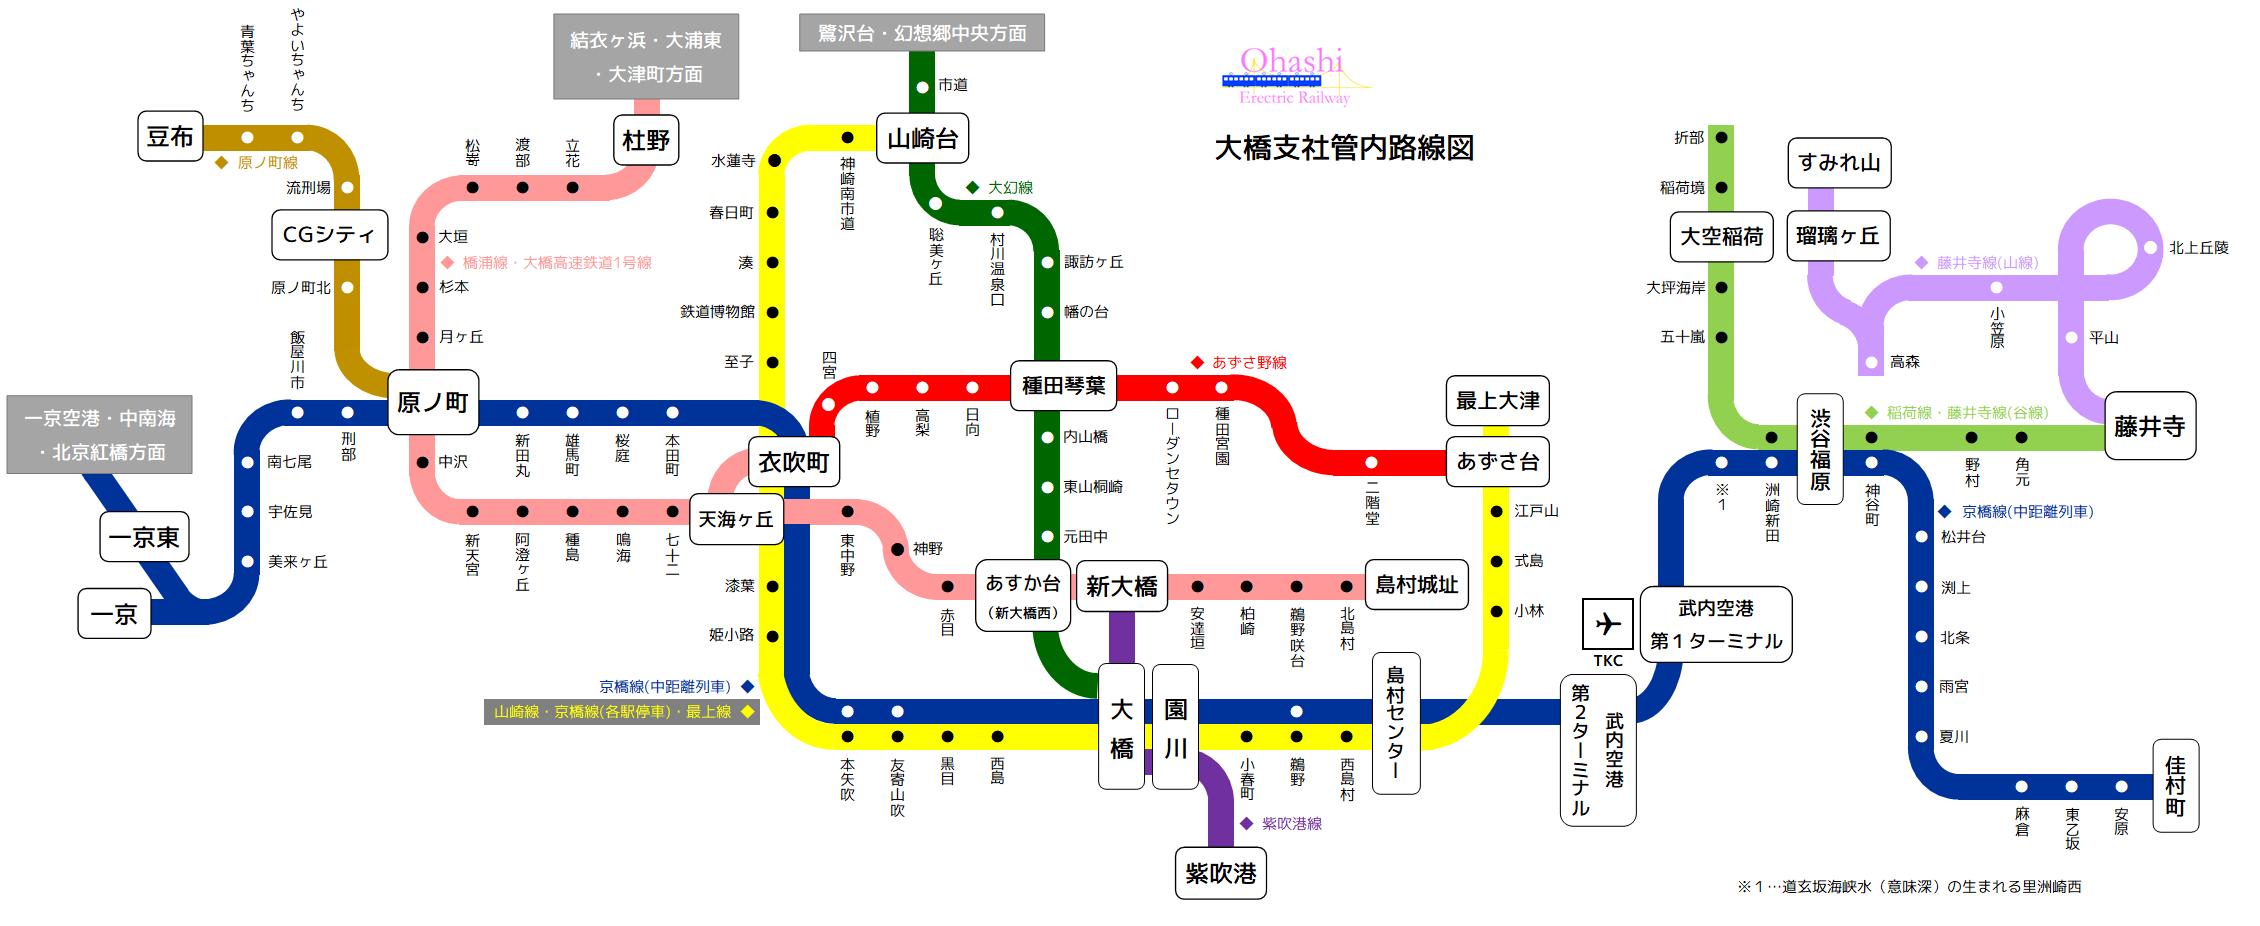 大橋#14路線図new.png